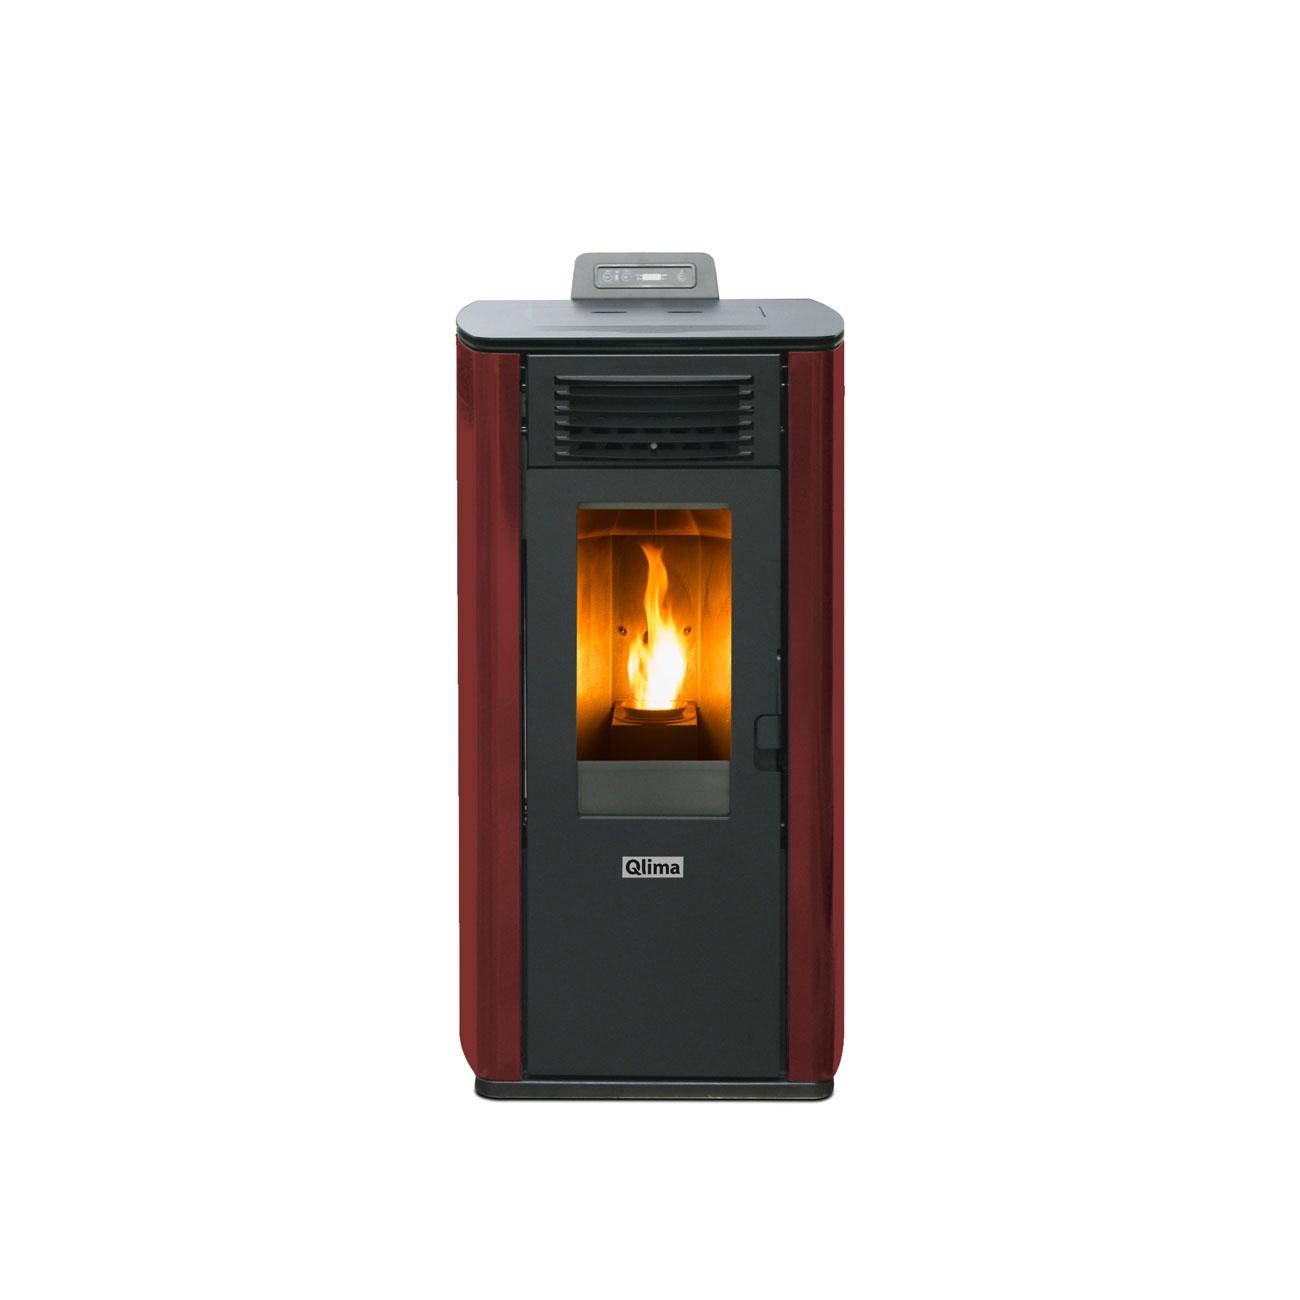 Qlima Fiorina 74 S-LINE Red Slim Pellet stove  8.24 kW - Reconditionel product 2